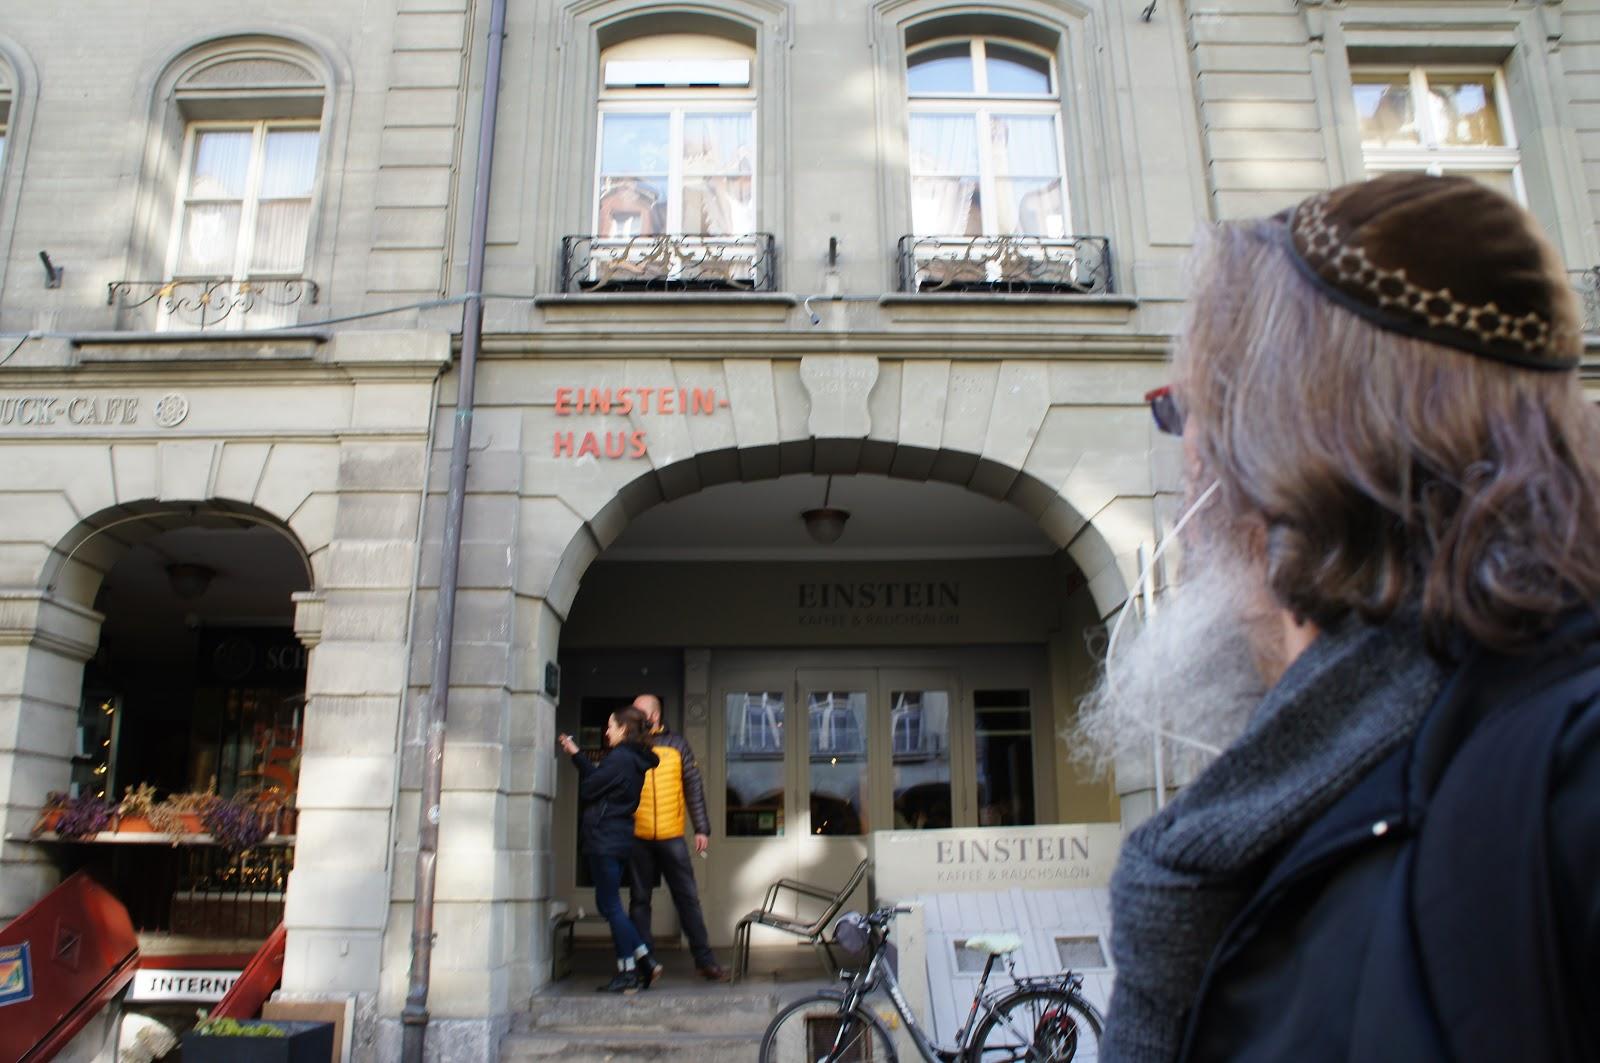 Kết quả hình ảnh cho Einsteinhaus